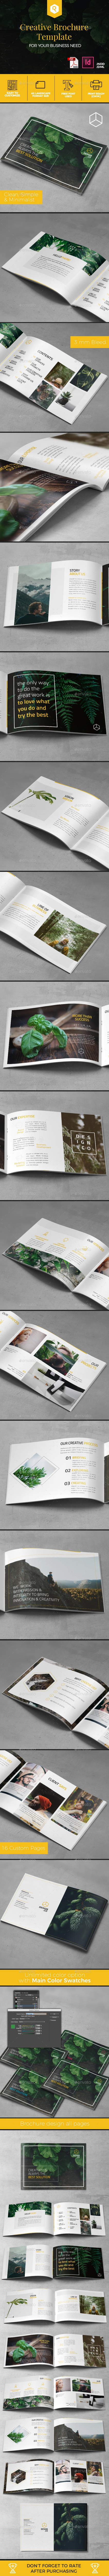 A5 Creative Brochure Template Vol. 01 - Corporate Brochures